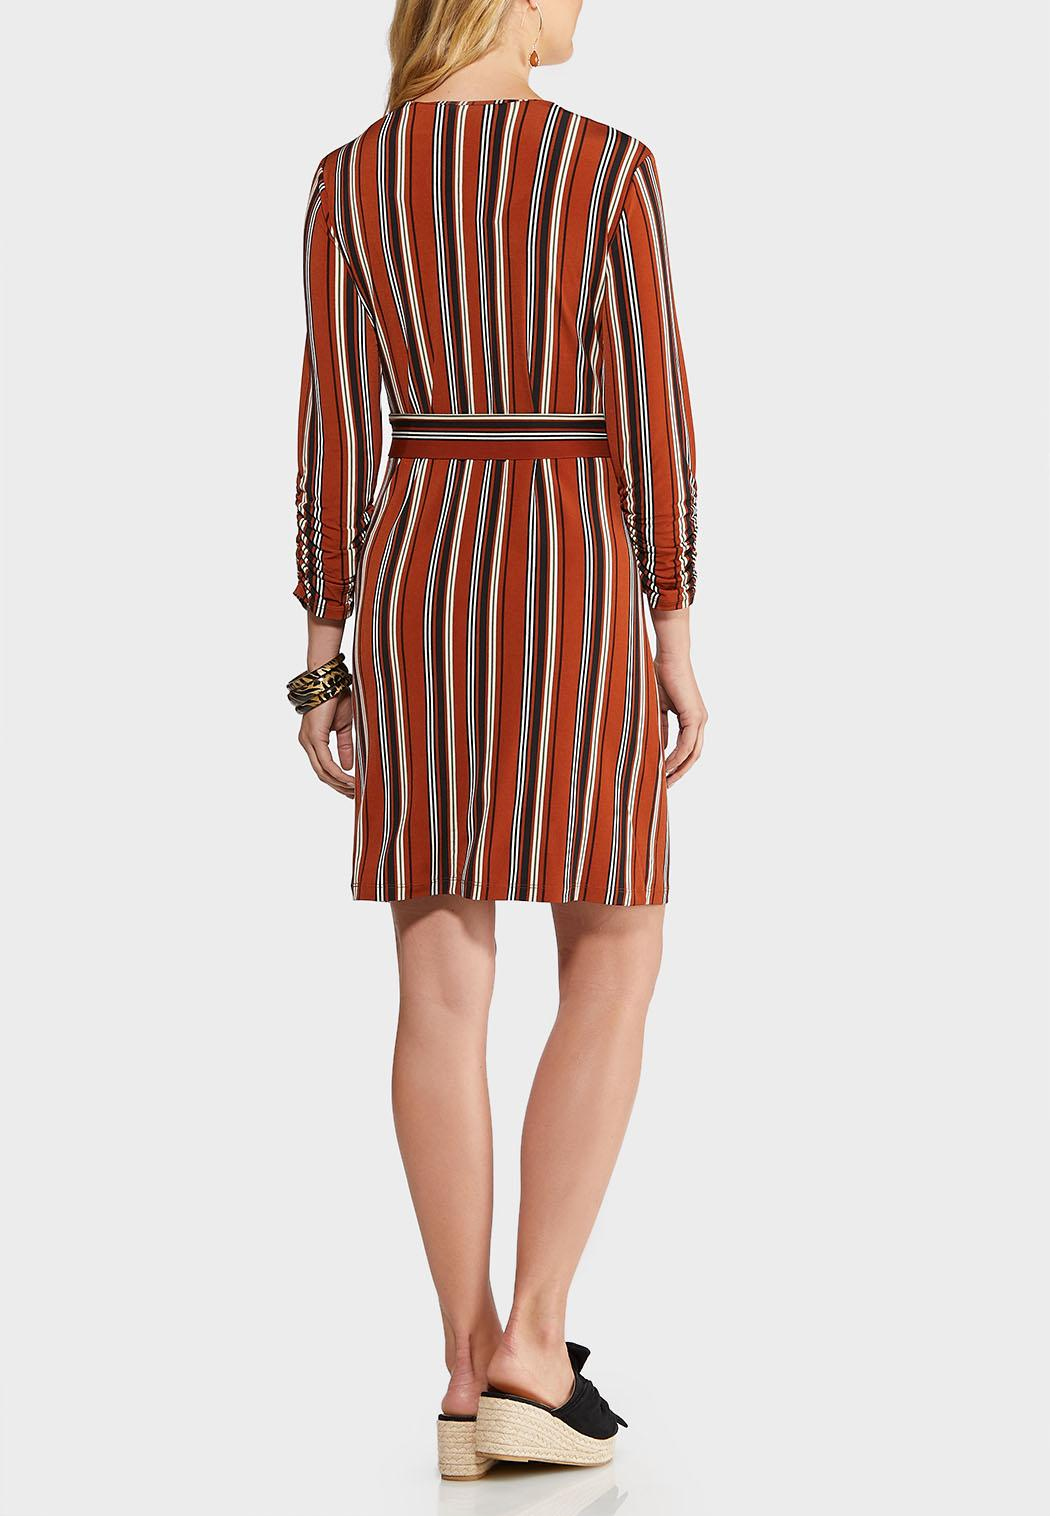 Plus Size Stripe Zip Front Shirt Dress (Item #43947882)